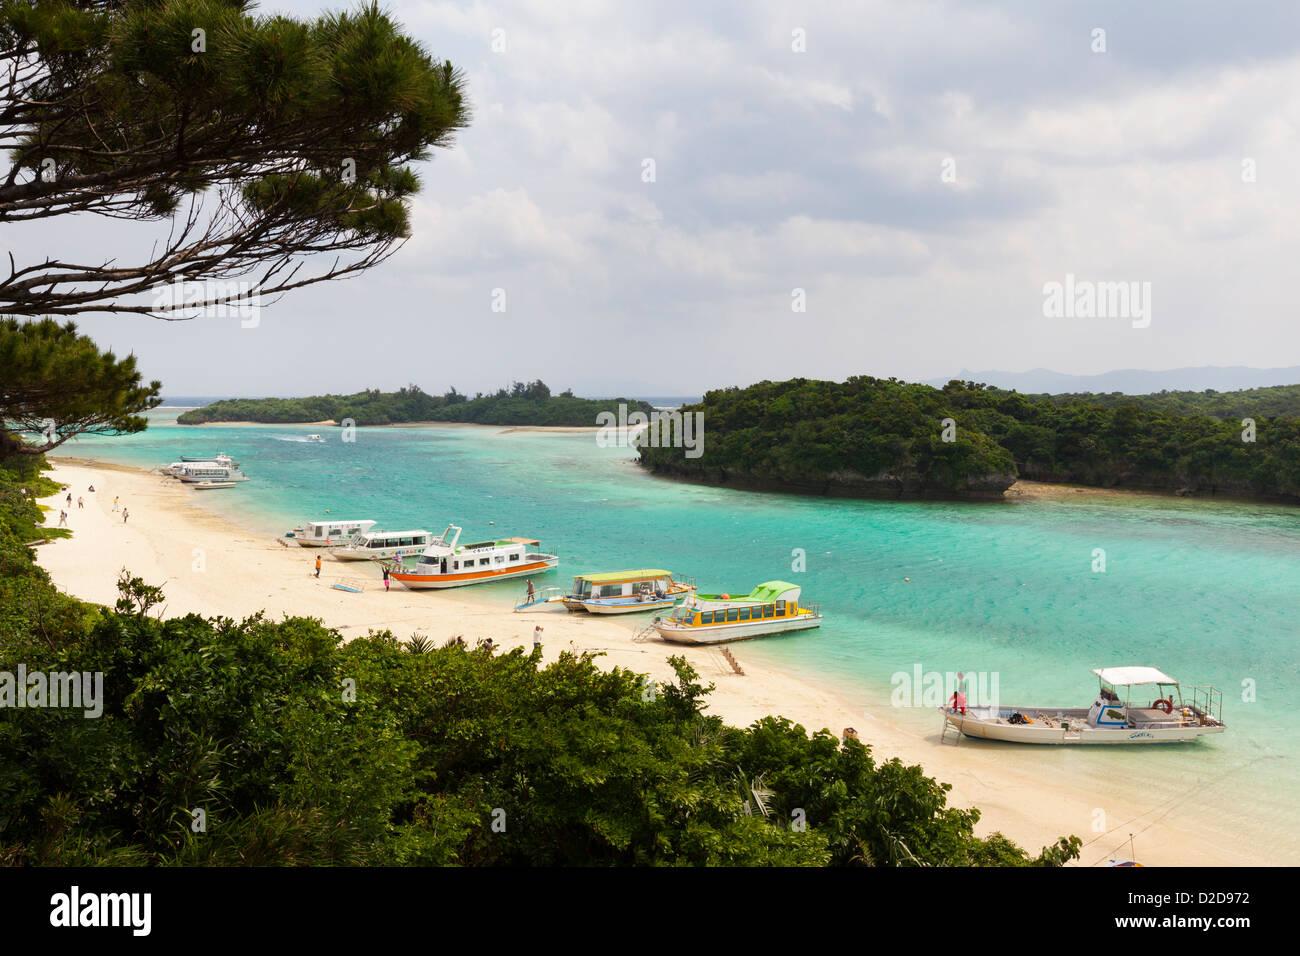 Kabira, Japan - April 6, 2012: Glass-bottomed tourist boats line the sandy beach at Kabira Bay, Ishigaki Island, - Stock Image